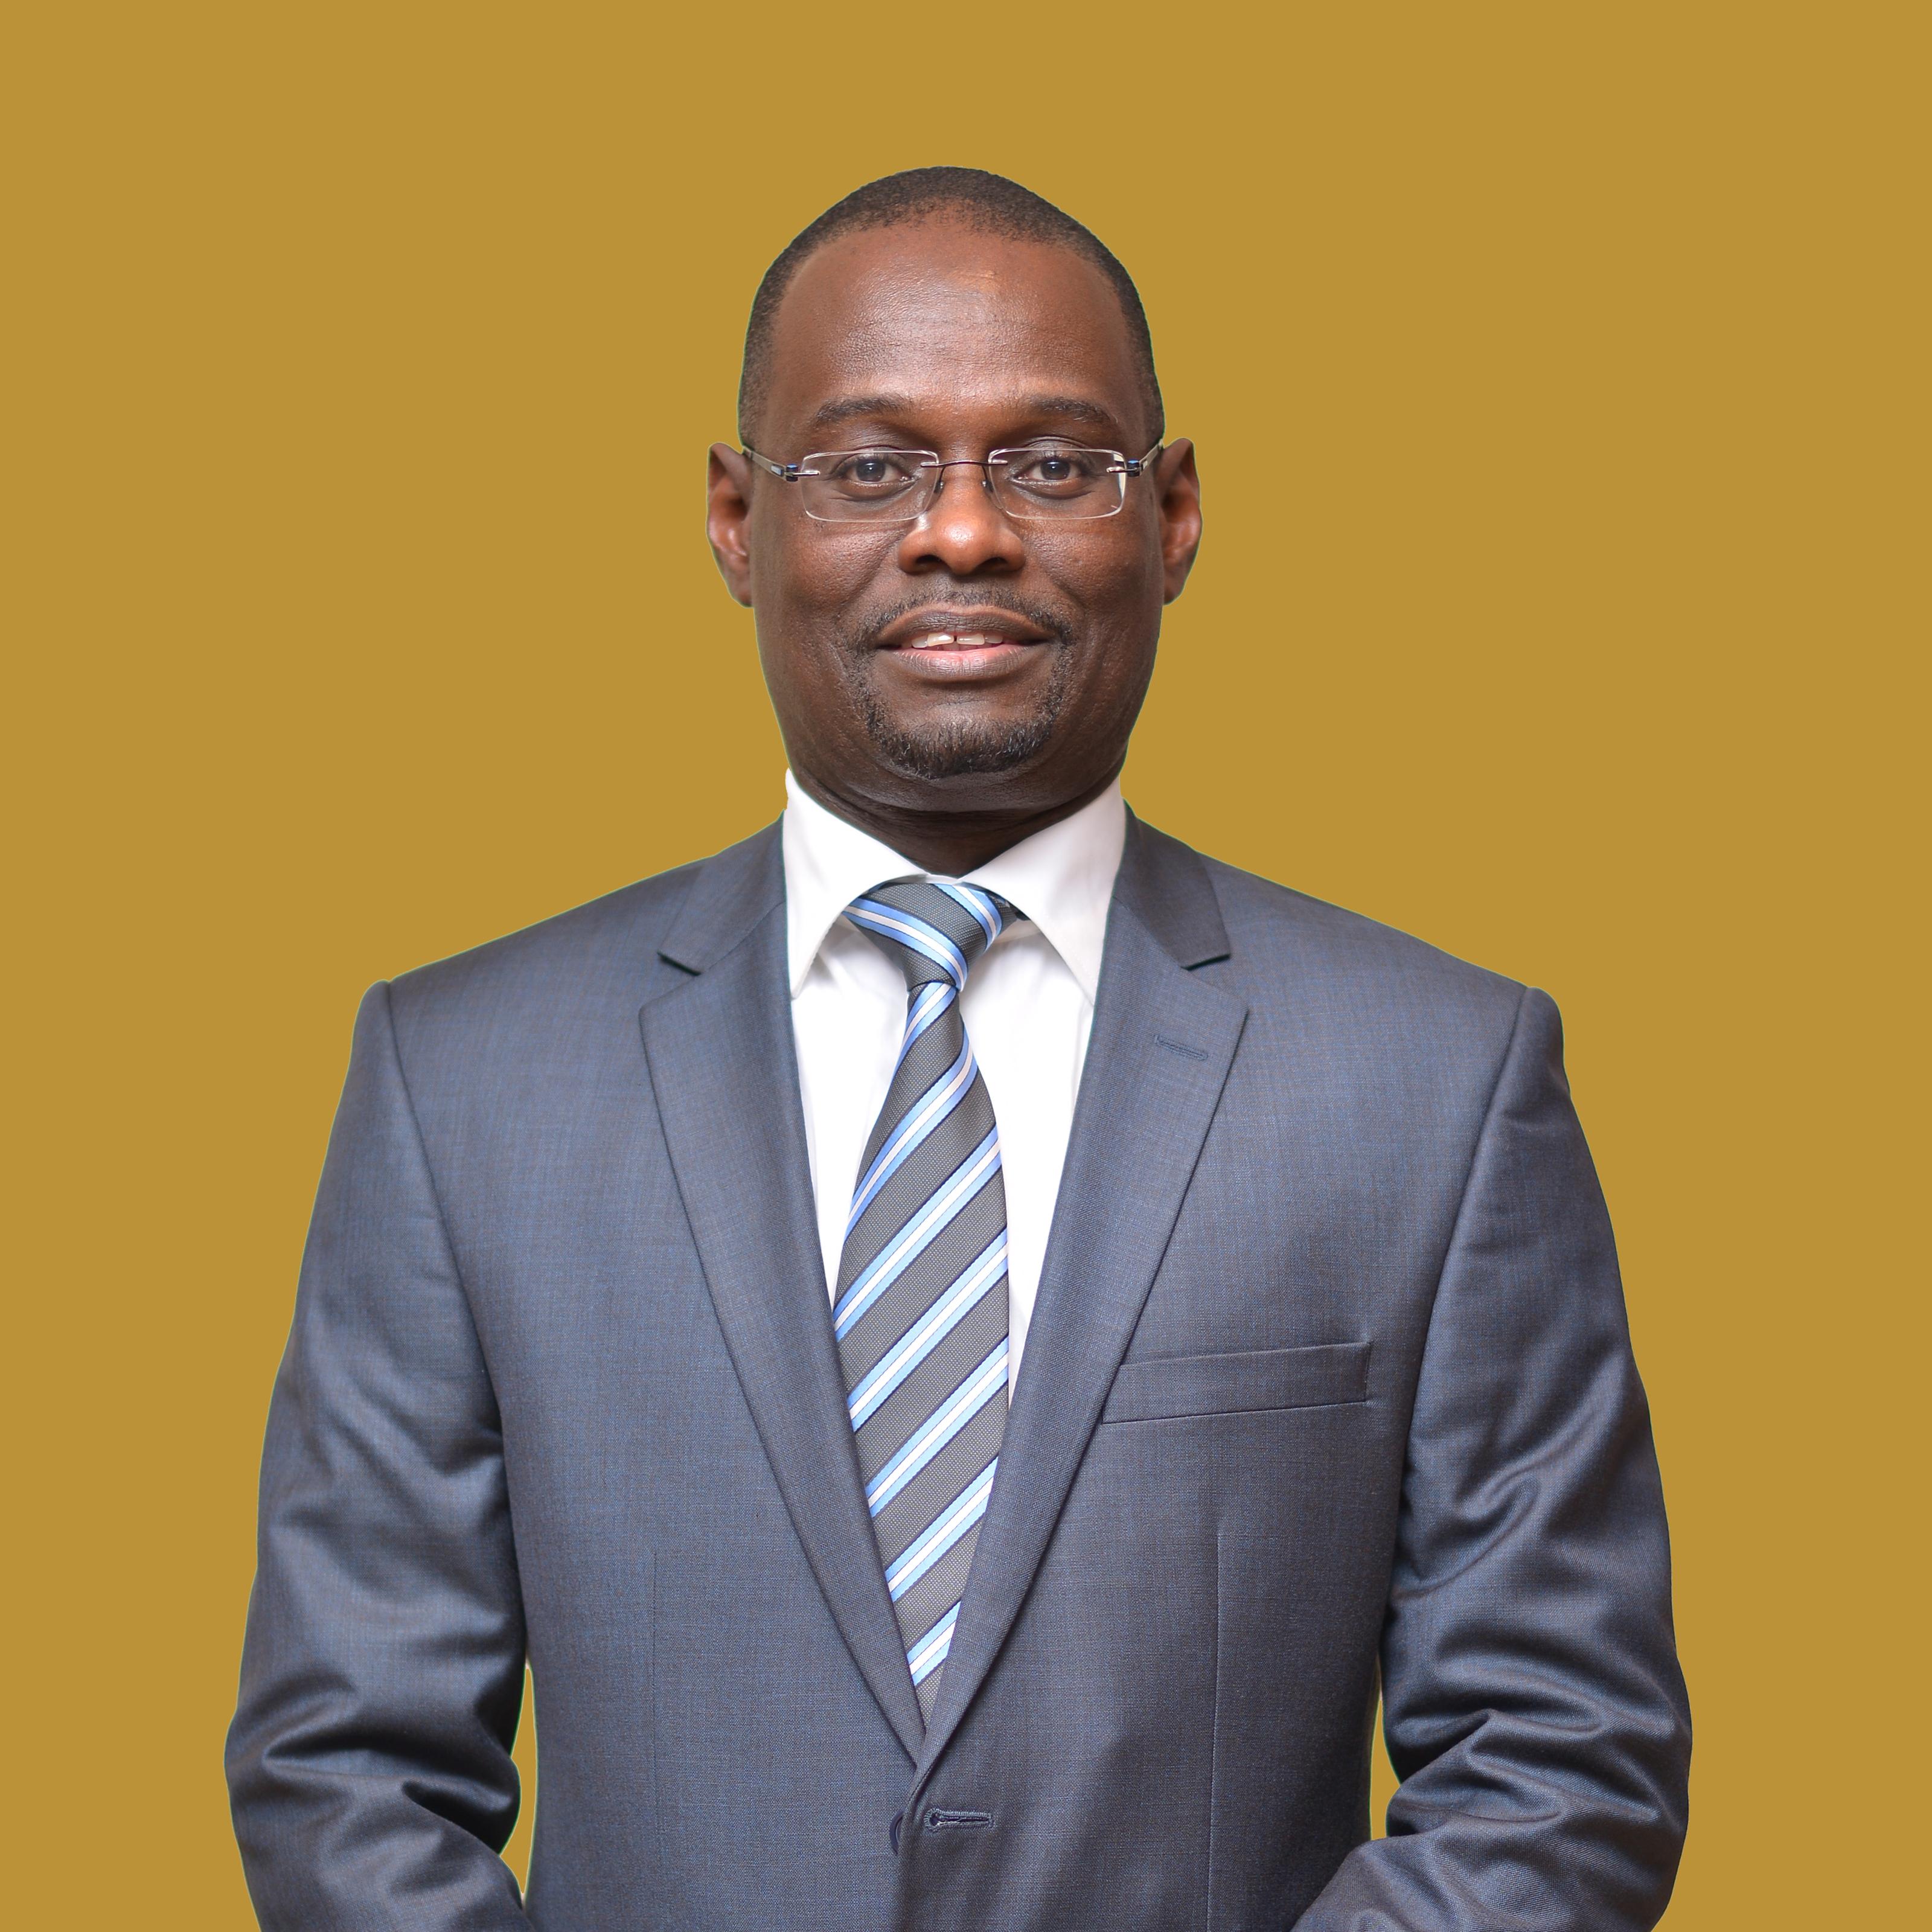 Edgar Alexander Mwandawiro,